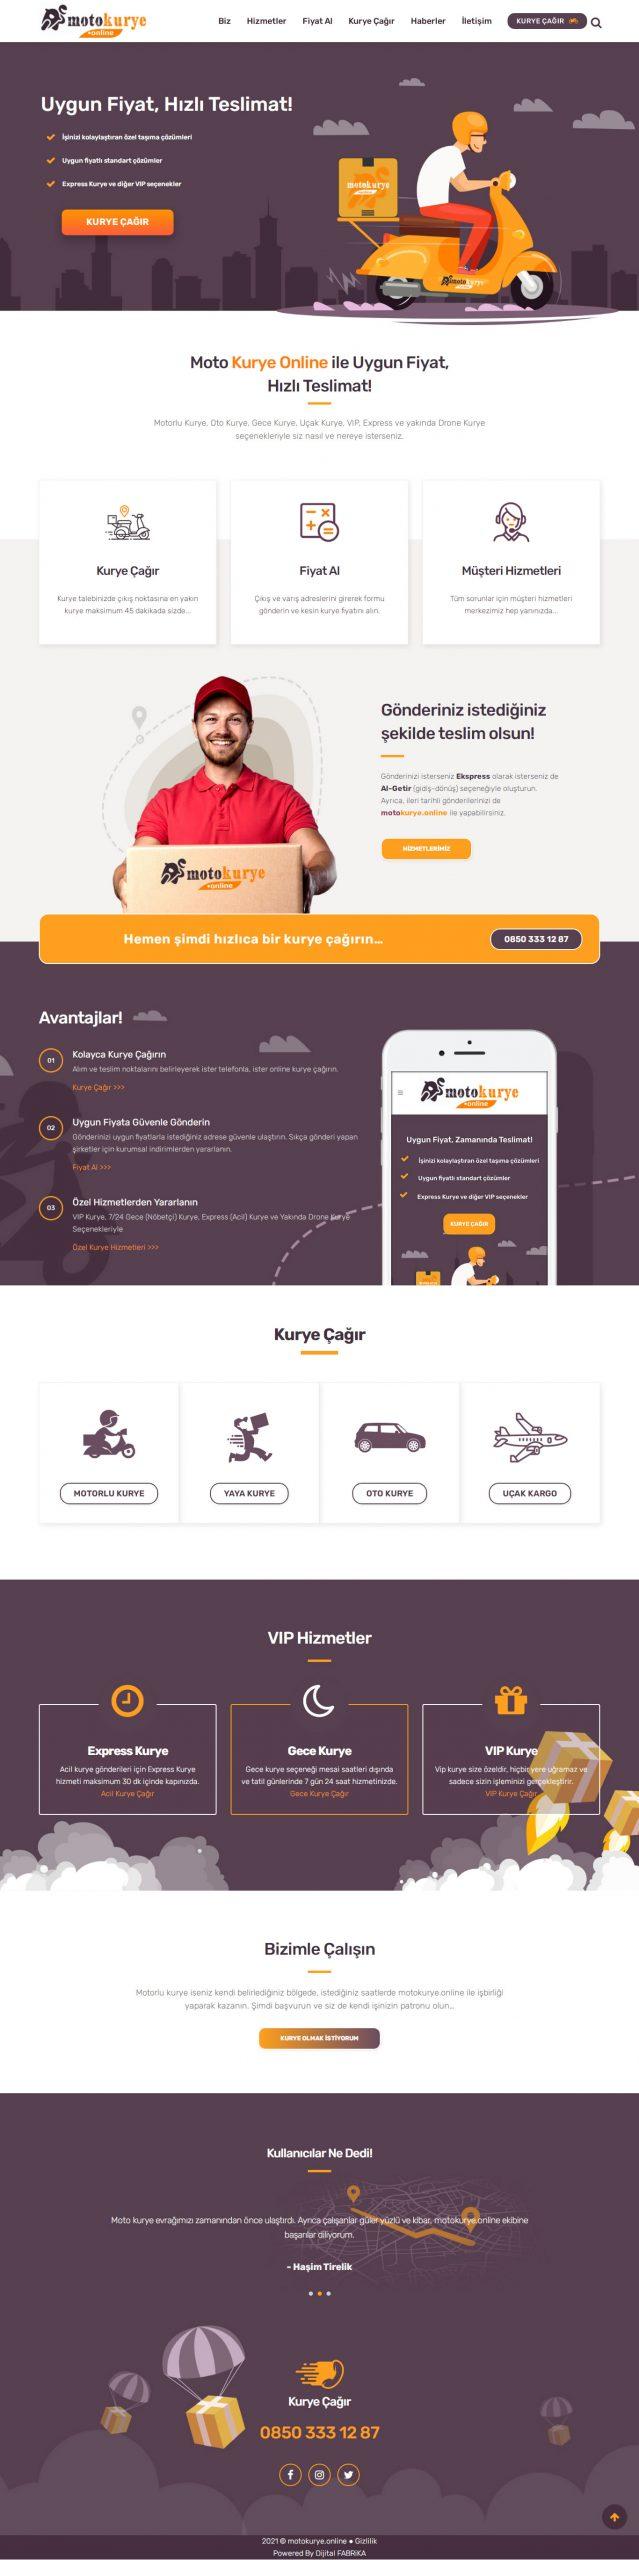 Moto Kurye Online Dijital Fabrika